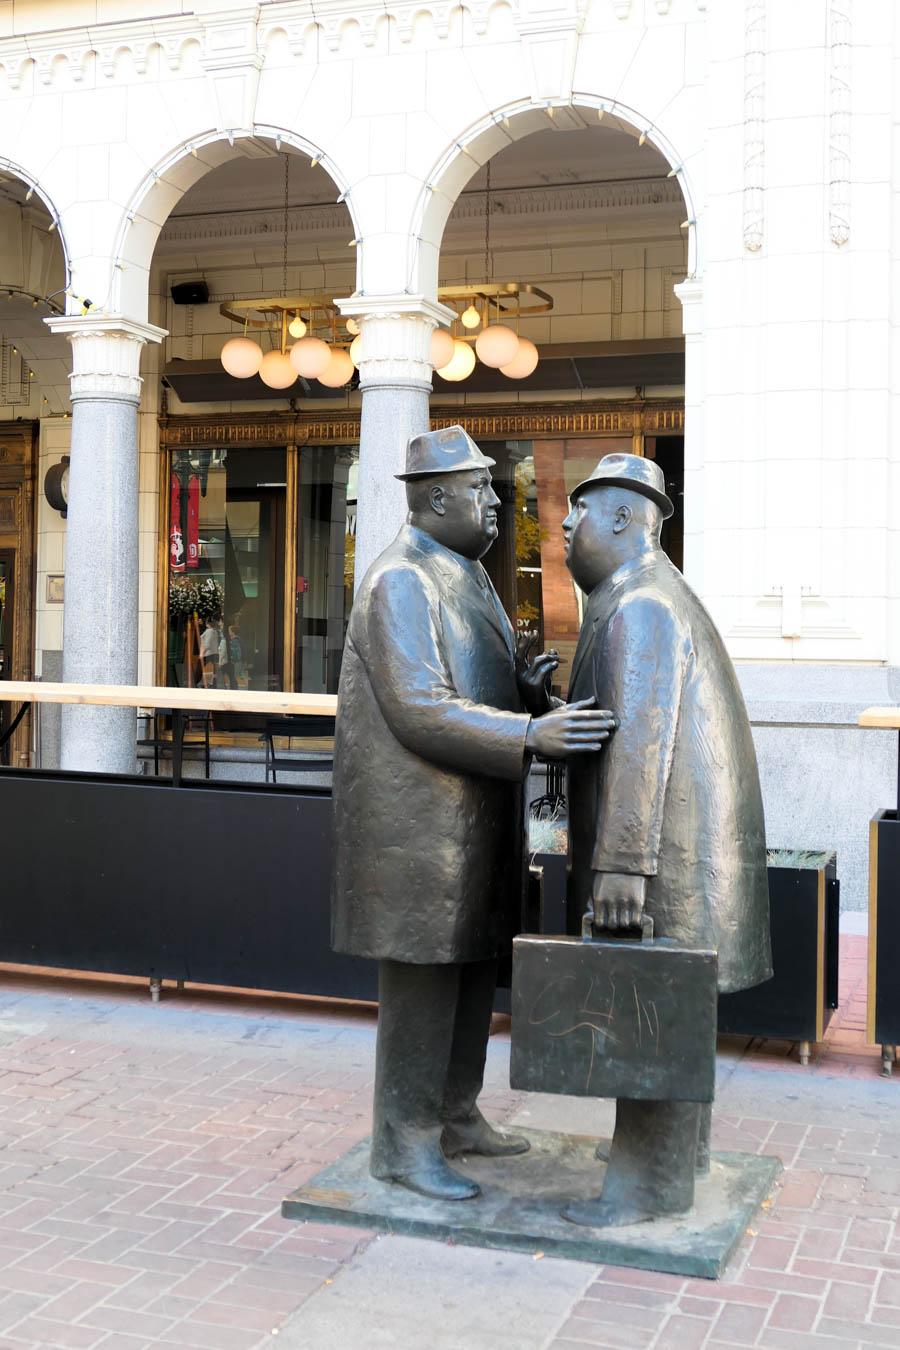 Men Meeting in the Street Statue in Calgary